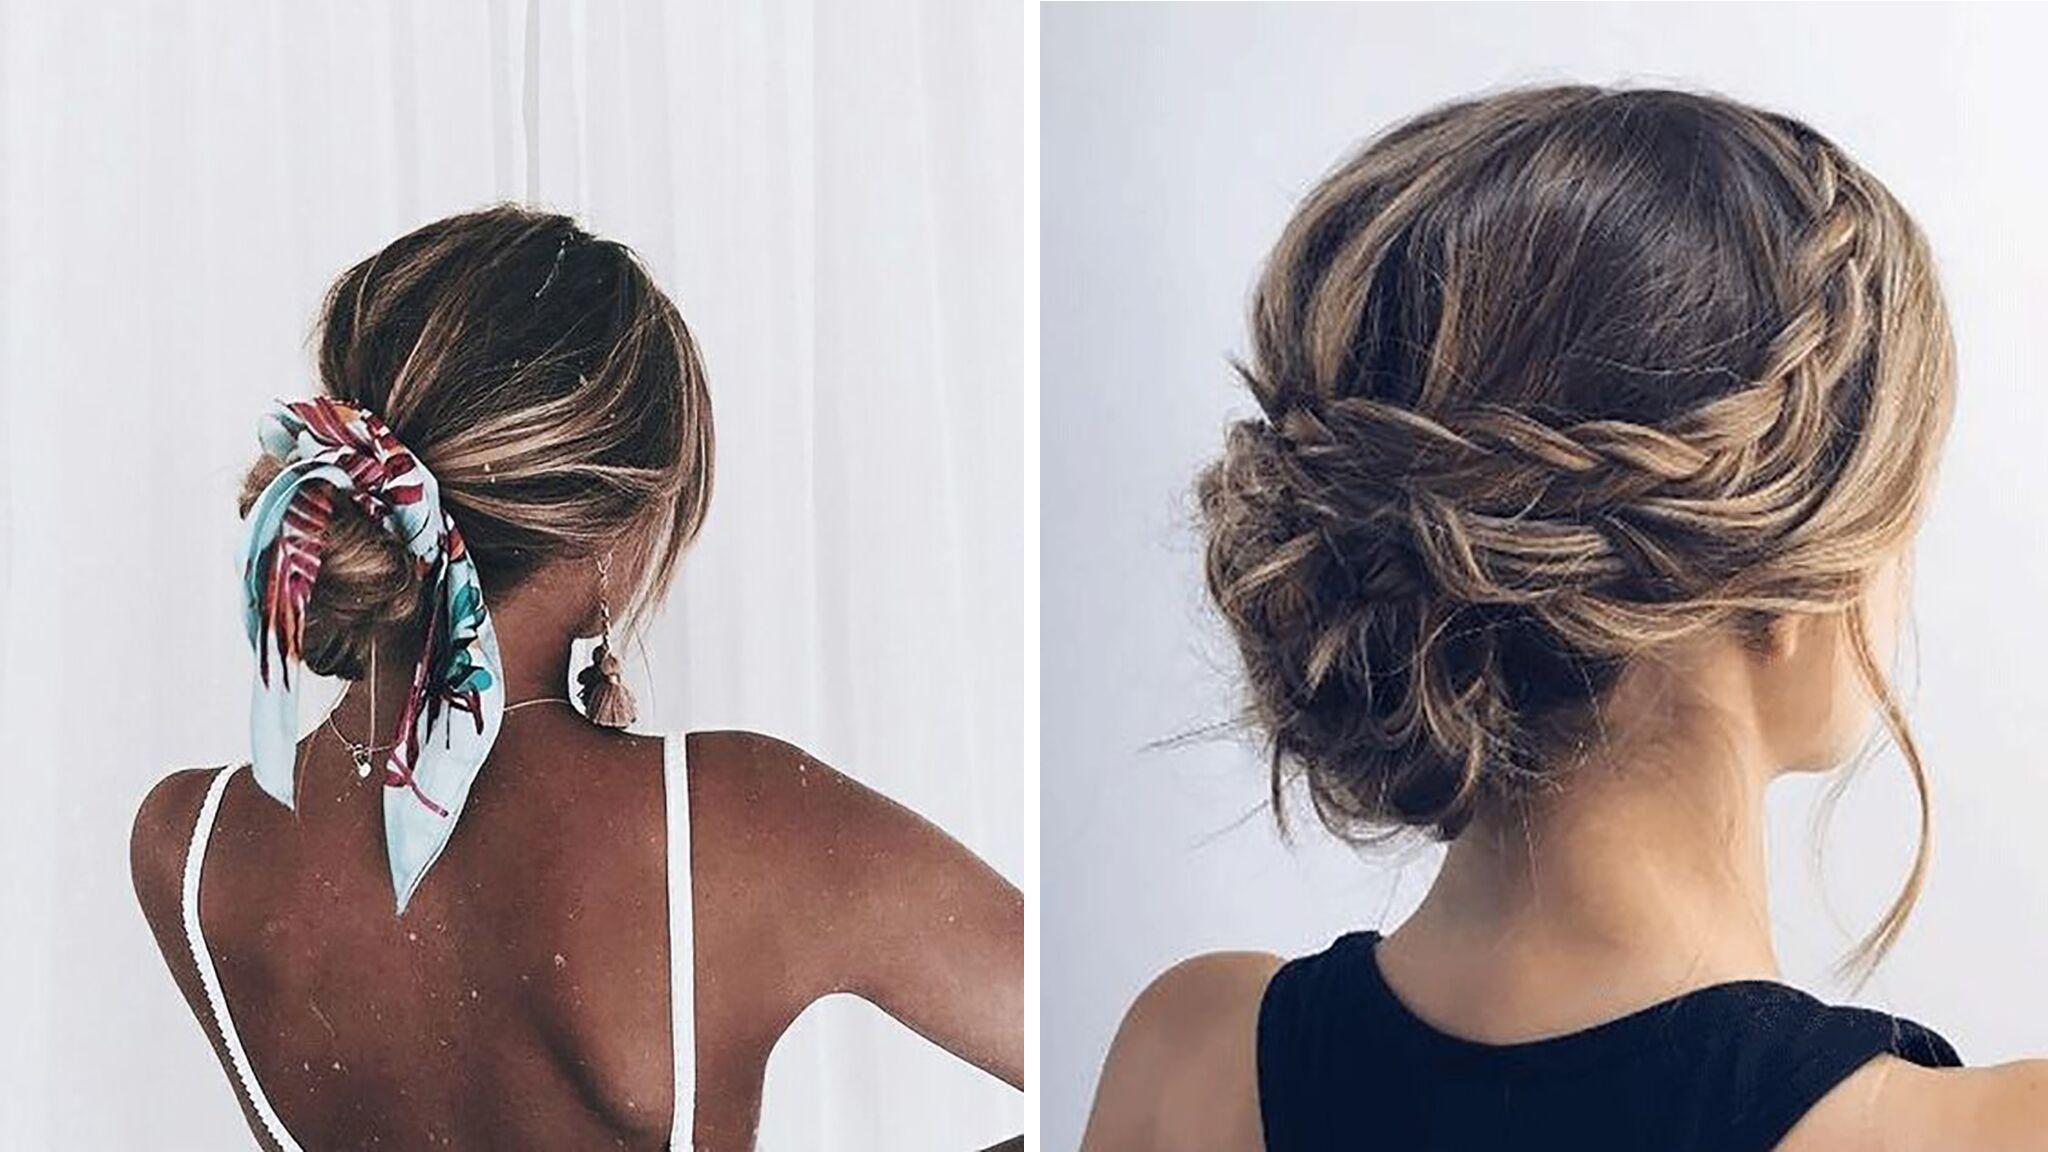 Cheveux 3 Idees De Coiffures Faciles A Realiser Voici